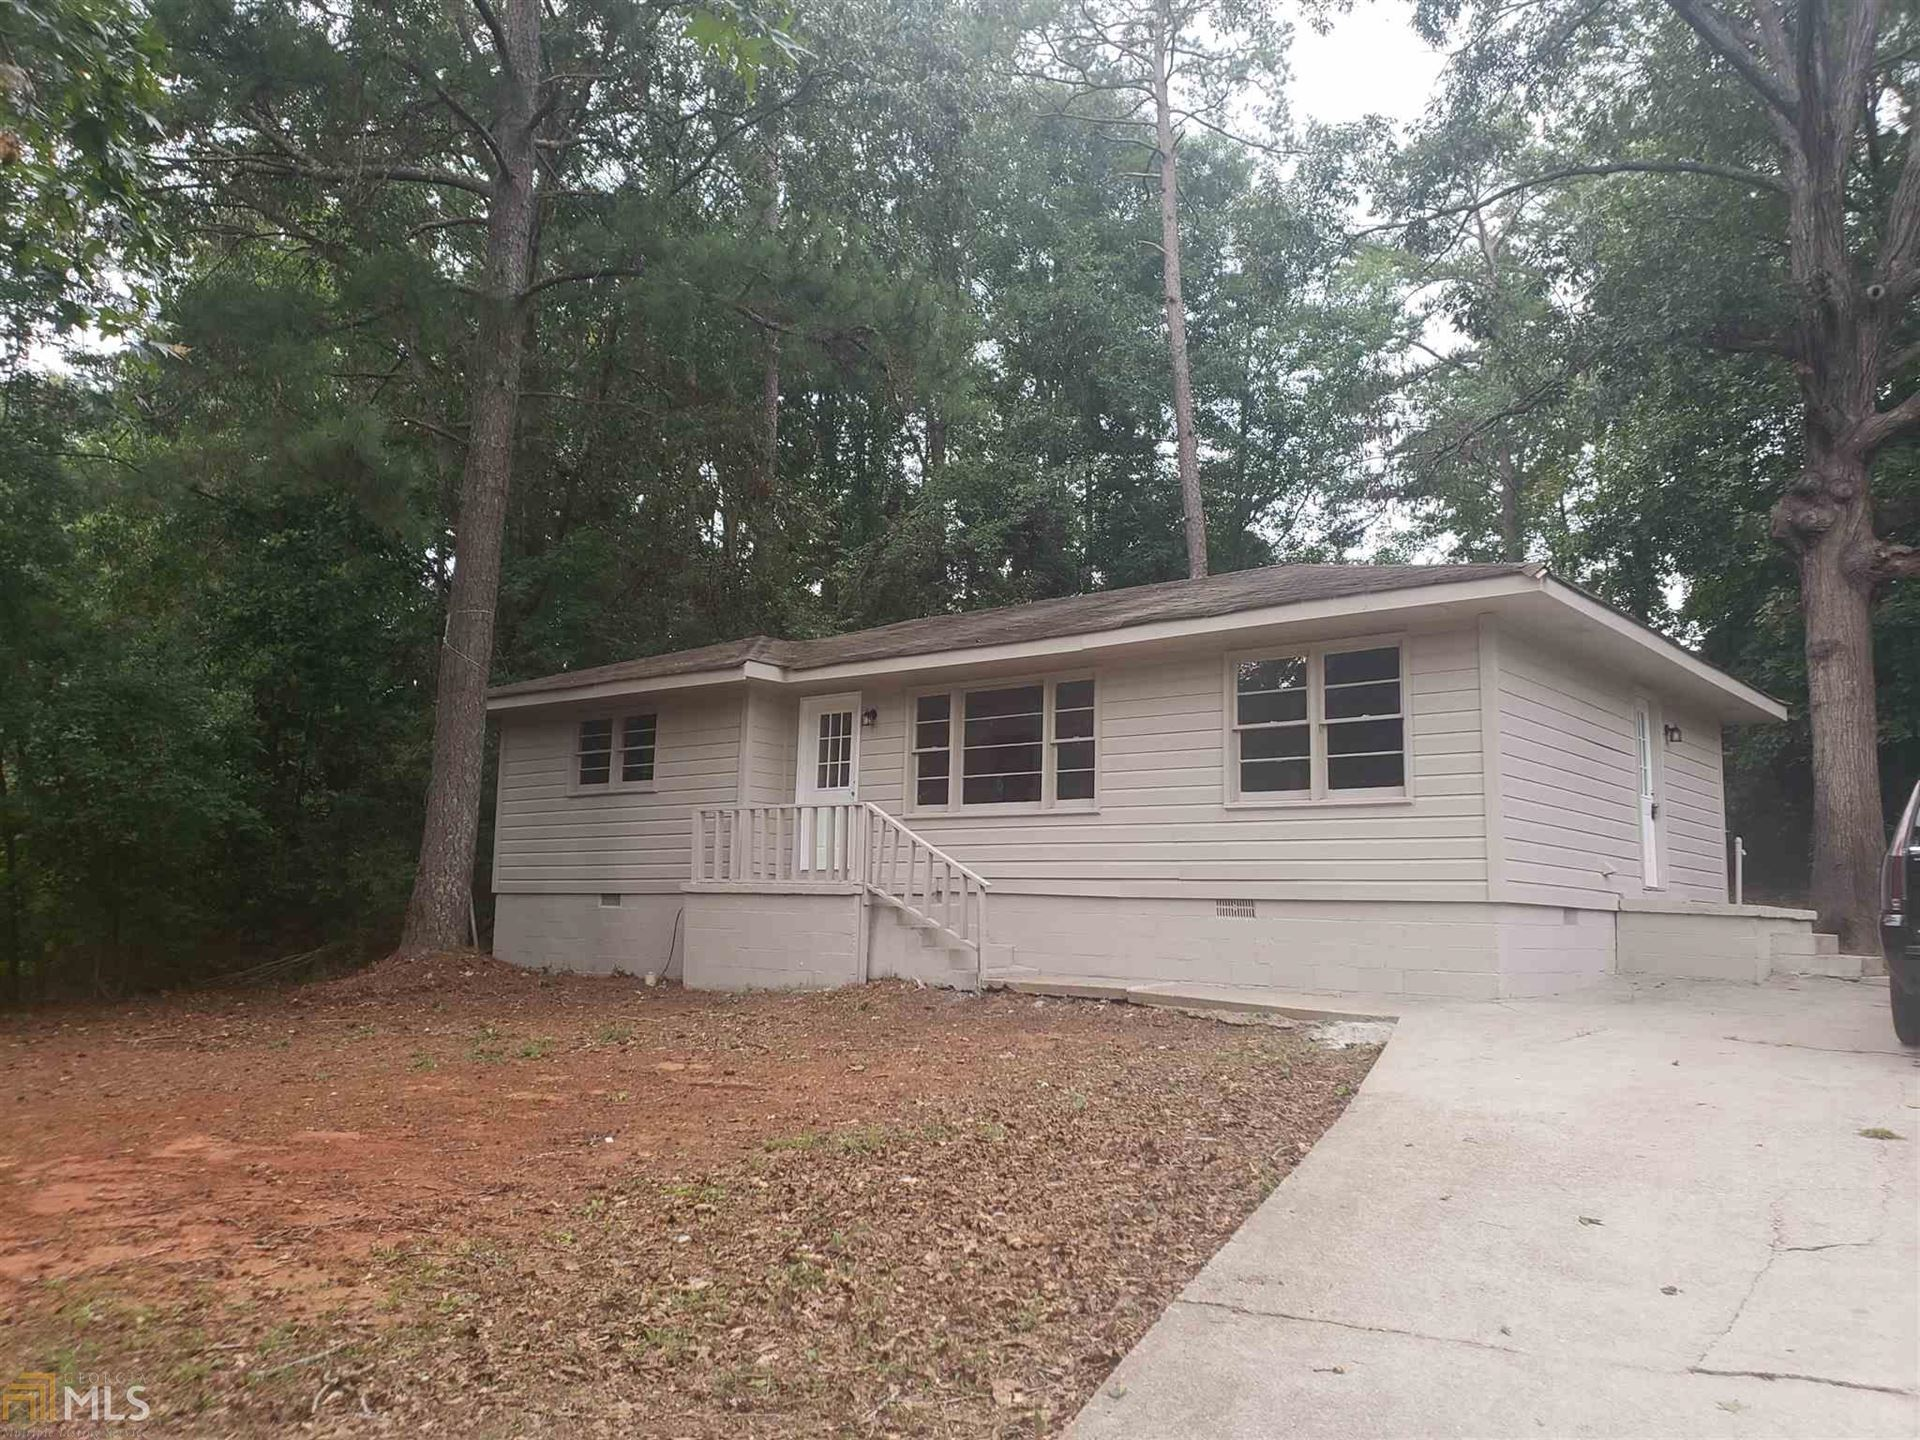 9206 Blackwell St, Covington, GA 30014 - #: 8837115